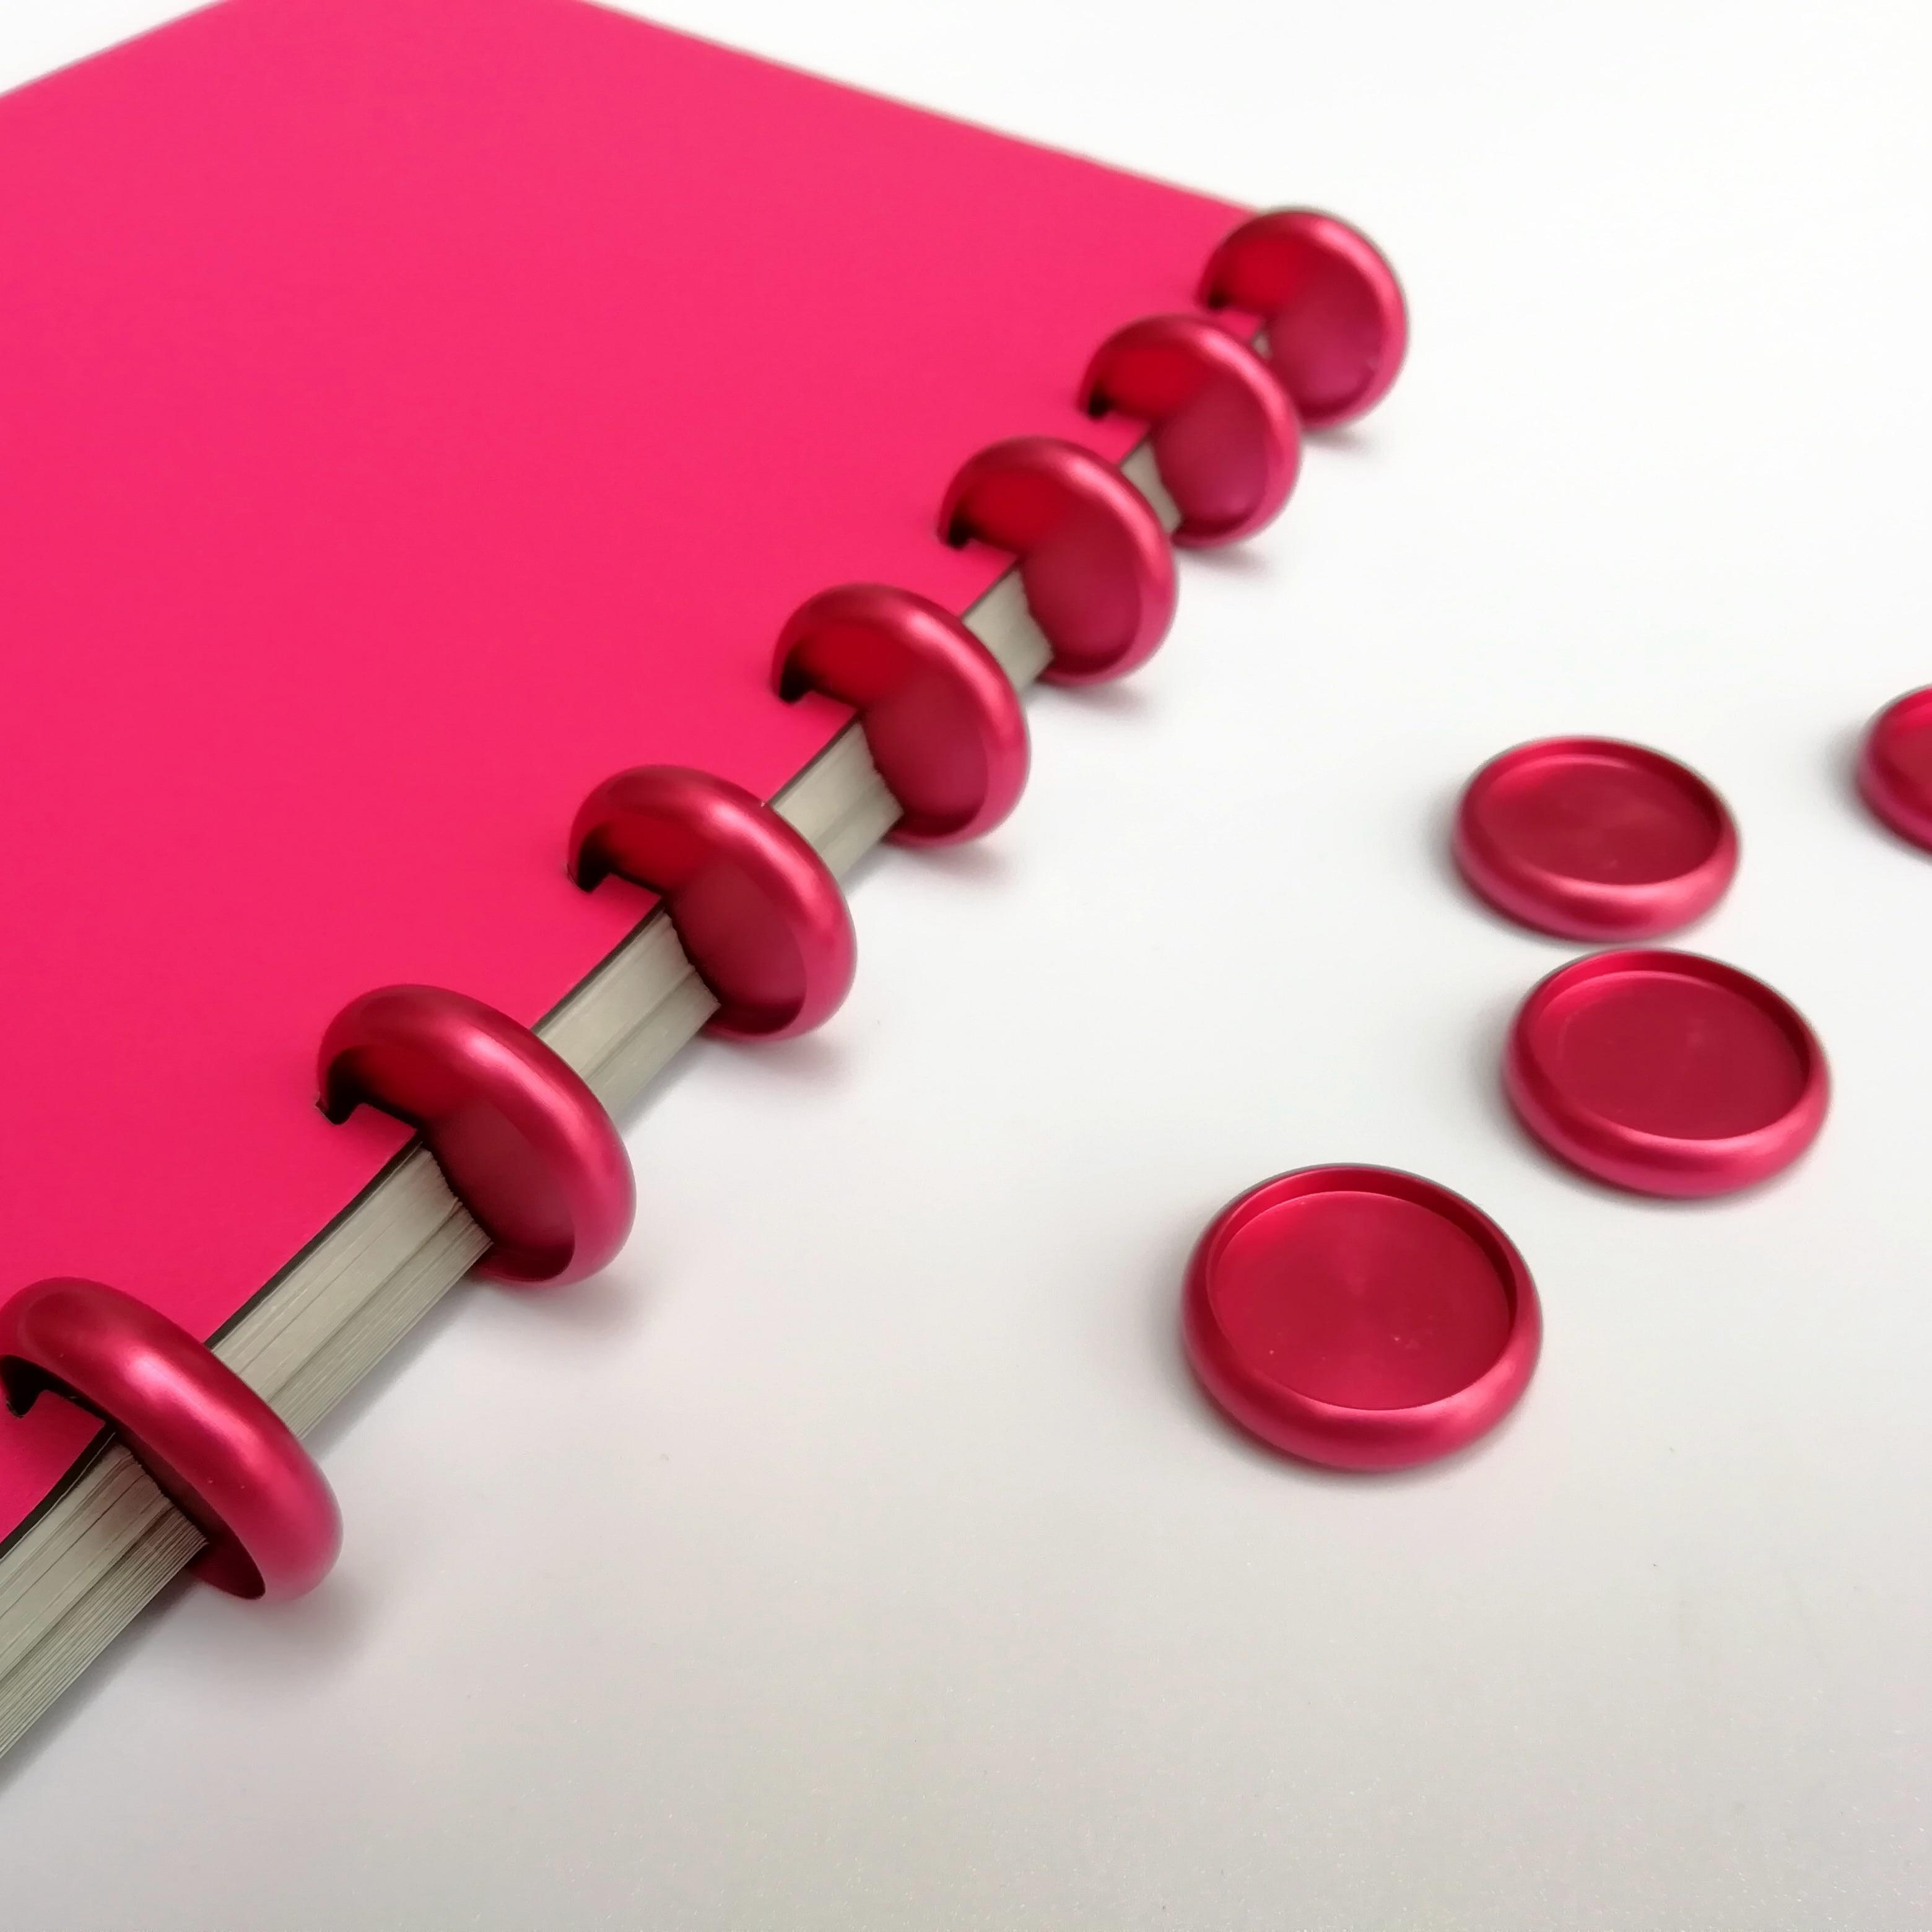 10pcs 24mm Aluminum Binding Ring Buckle Mushroom Hole Binder With Metal Disc Disc Binding  Book Binding Supplies A5 Binder